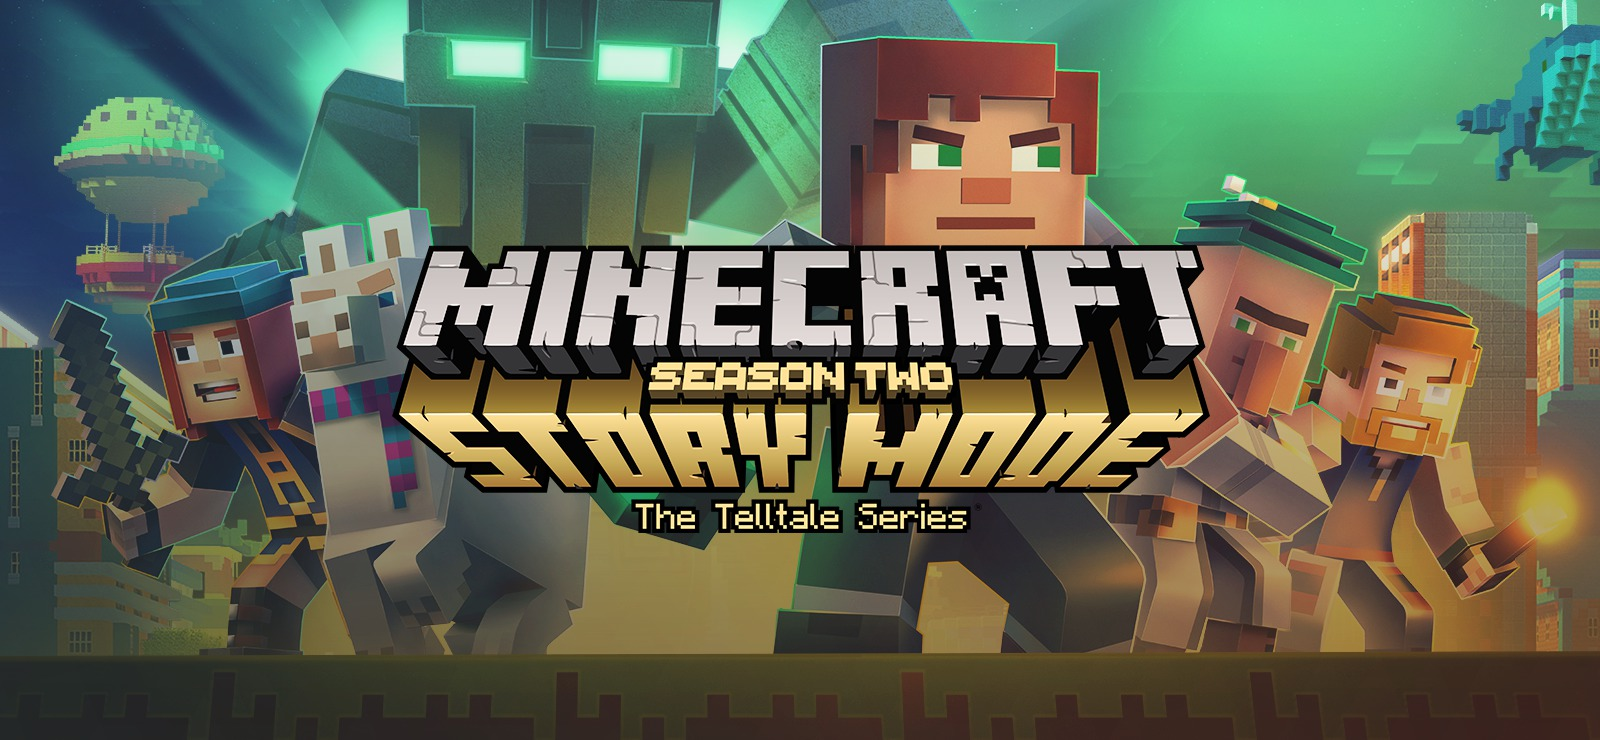 Descargar Minecraft Story Mode Season Two Para Pc 2018 Full Espanol